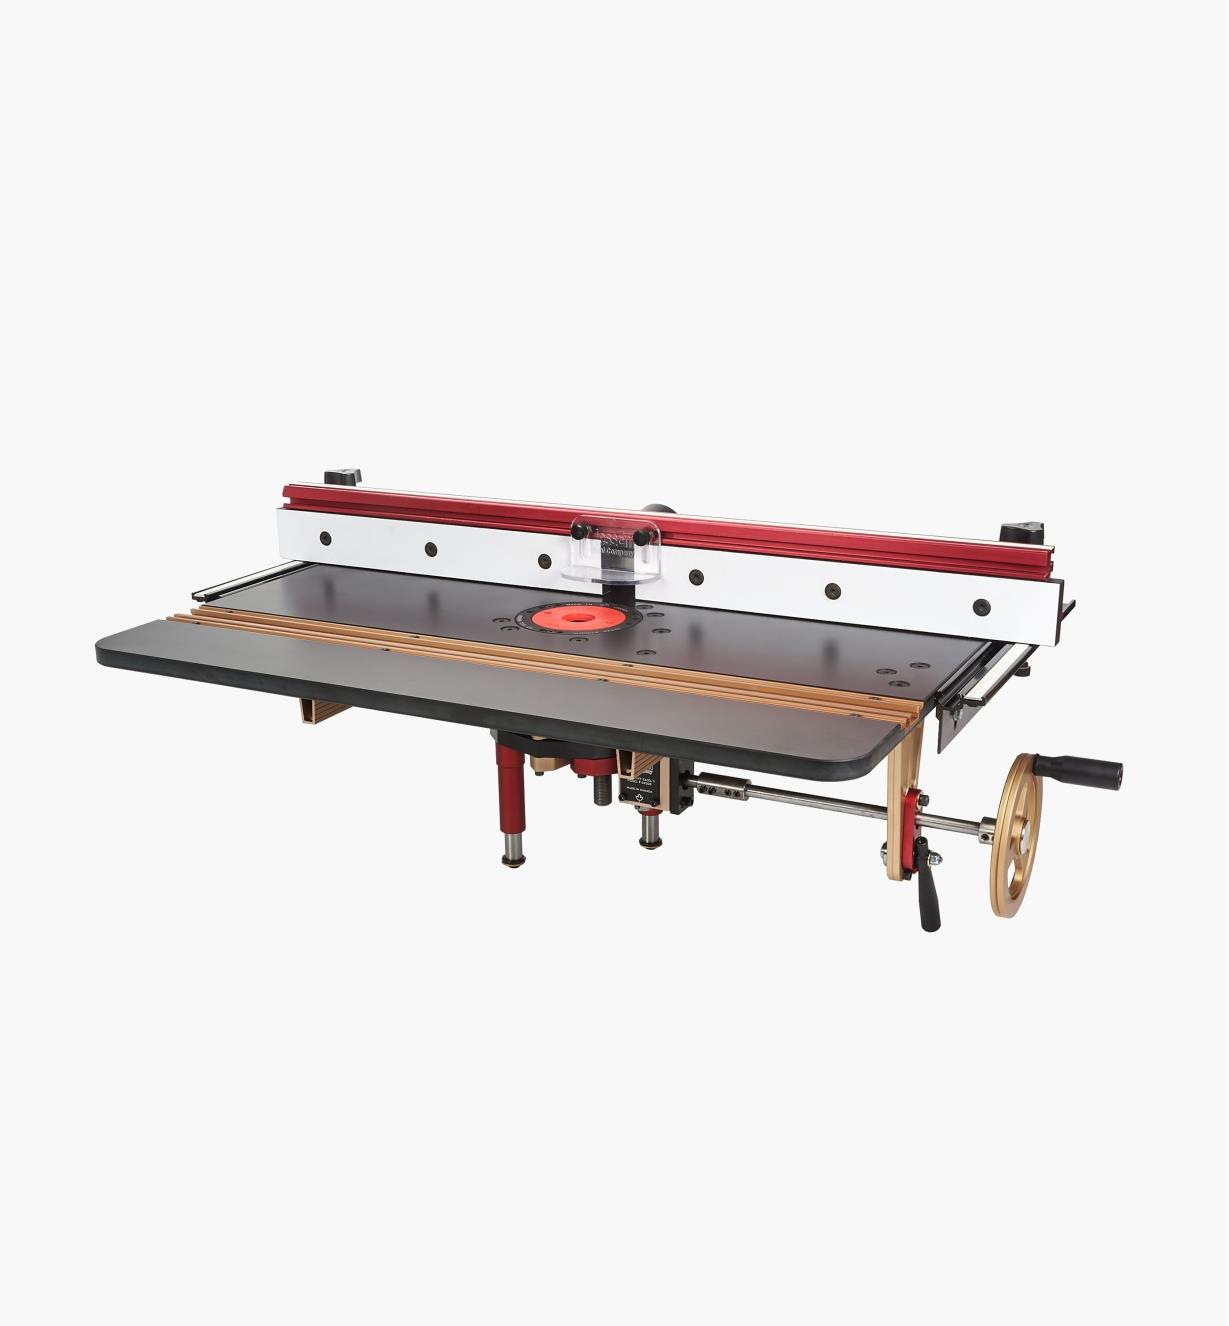 86N4245 - JessEm Mast-R-Lift Excel II + Fence